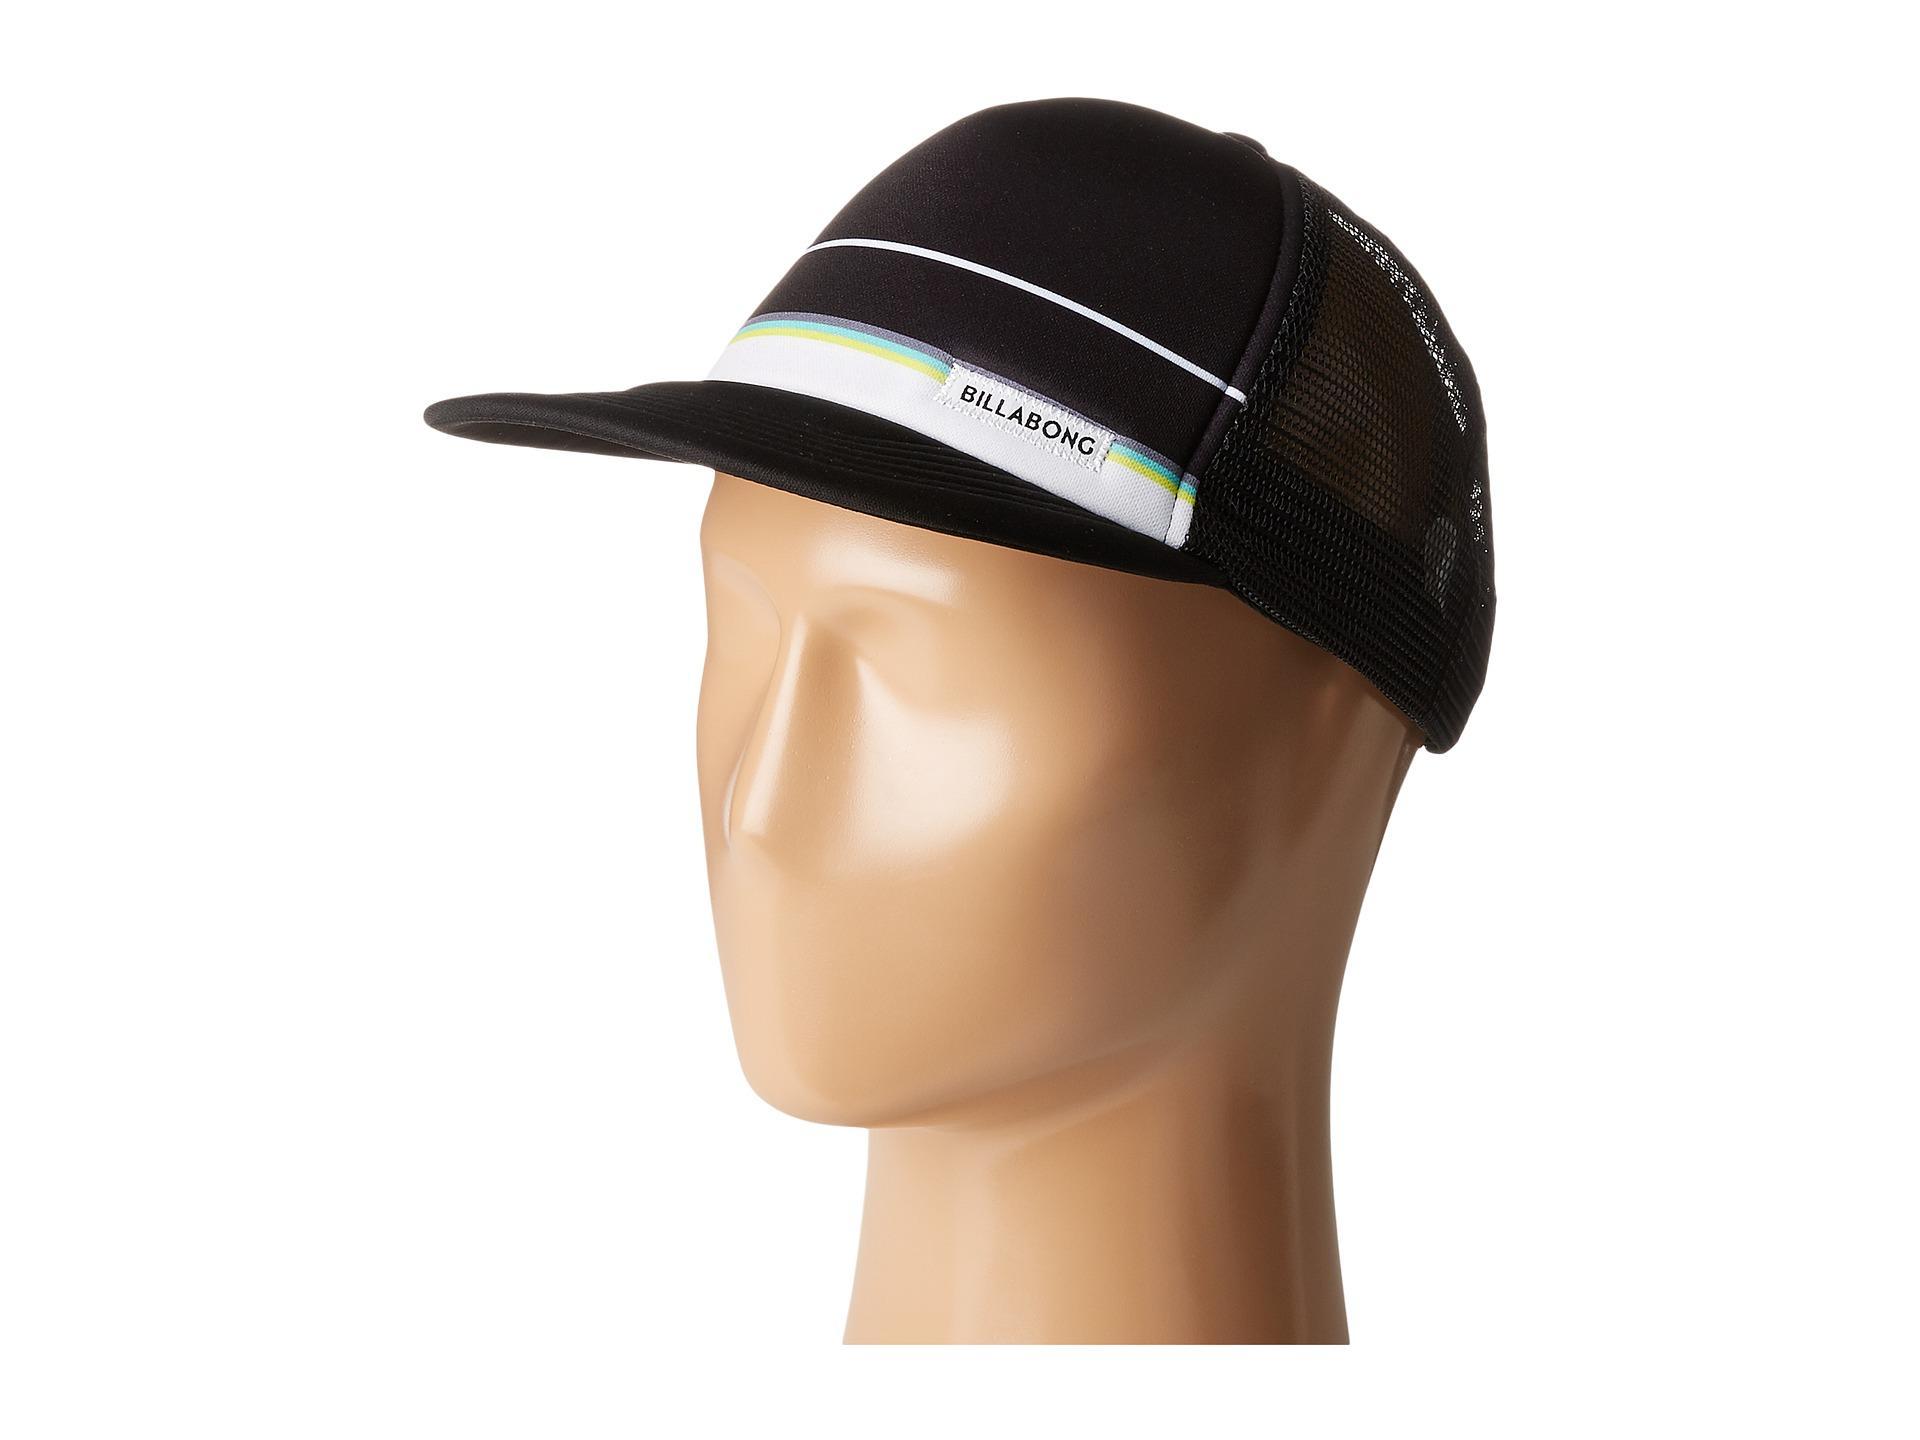 fd86818ad2a6a Lyst - Billabong Spinner Trucker Hat in Black for Men